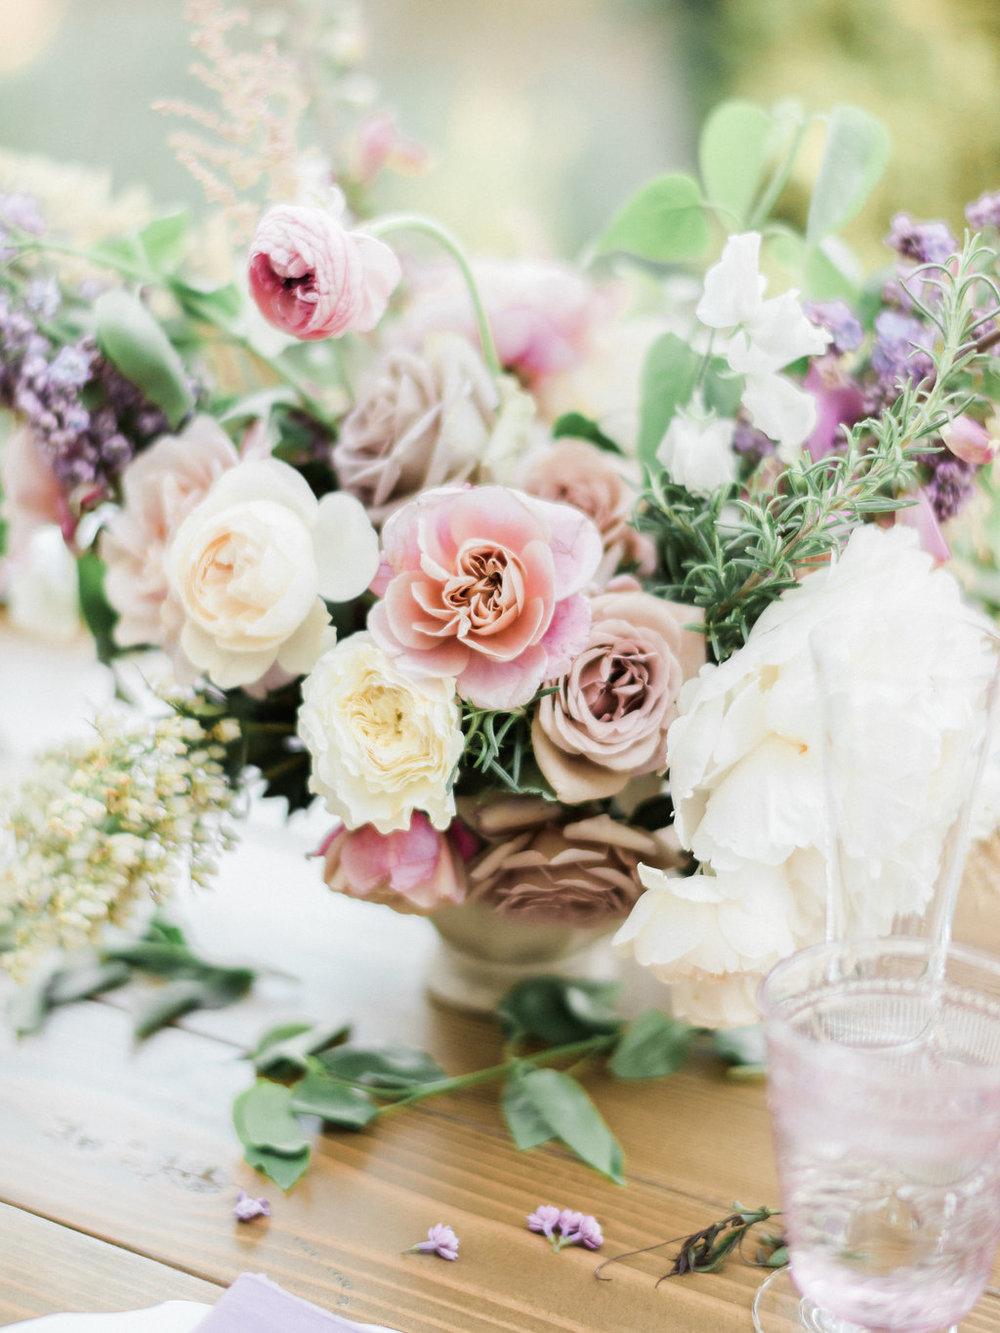 linajaandmichael-wedding-851.jpg